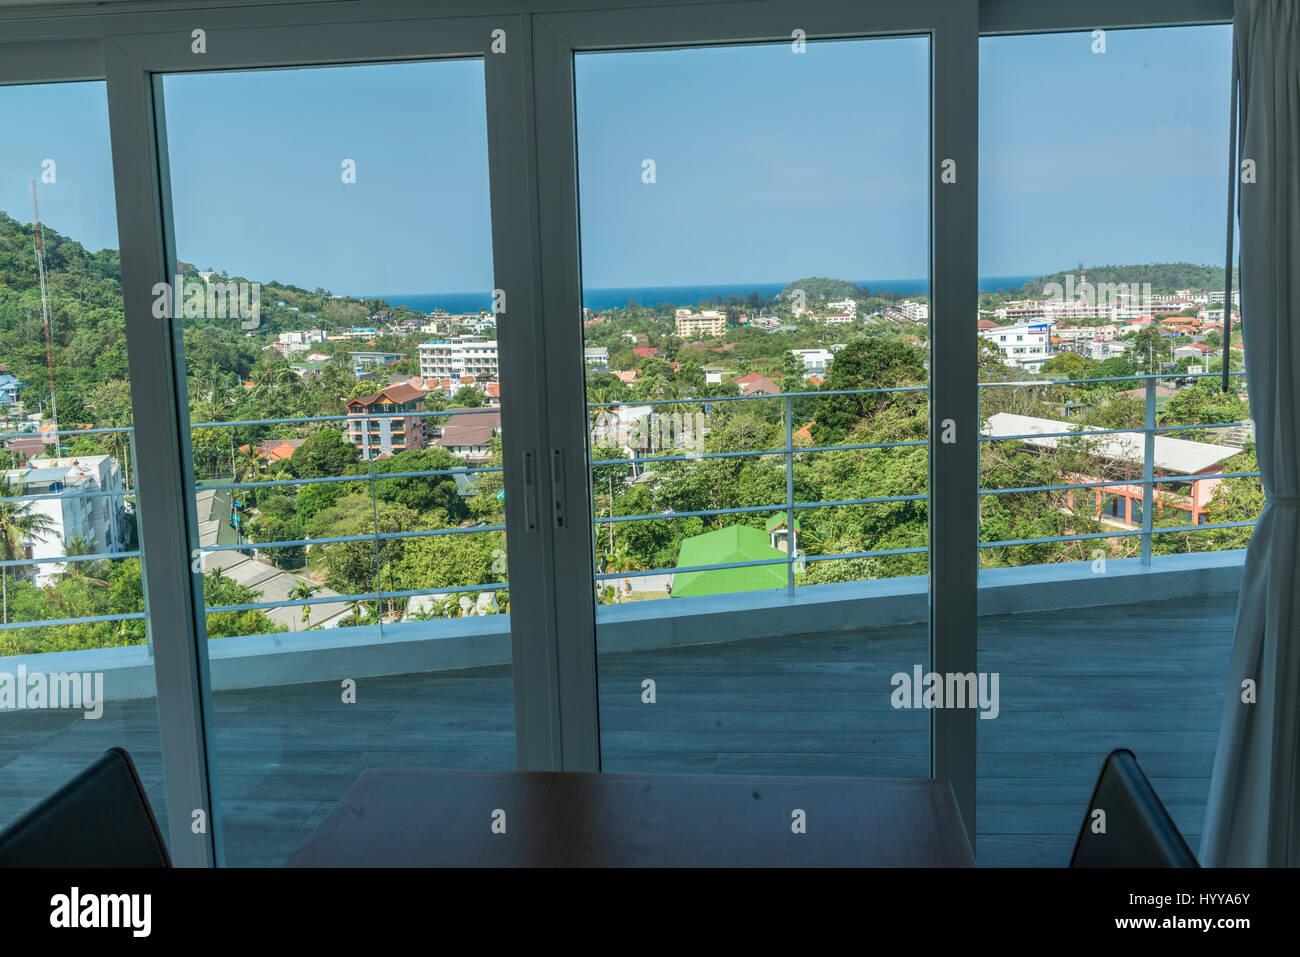 Luxurious properties in Phuket, Thailand. 09-Mar-2017 - Stock Image